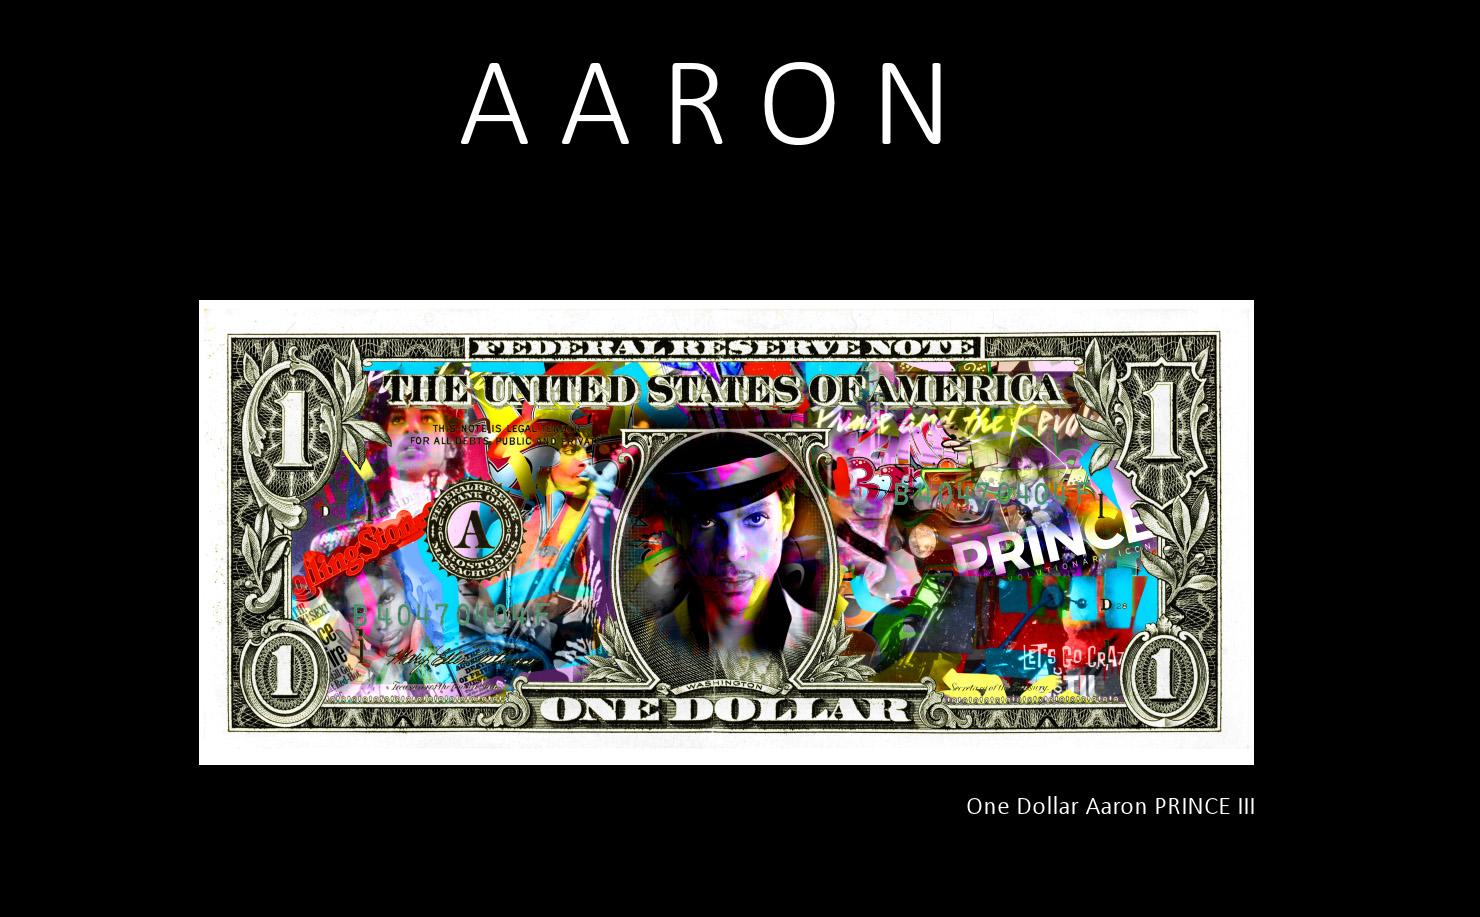 aaron-artiste-icone-dollar-sculpture-prince